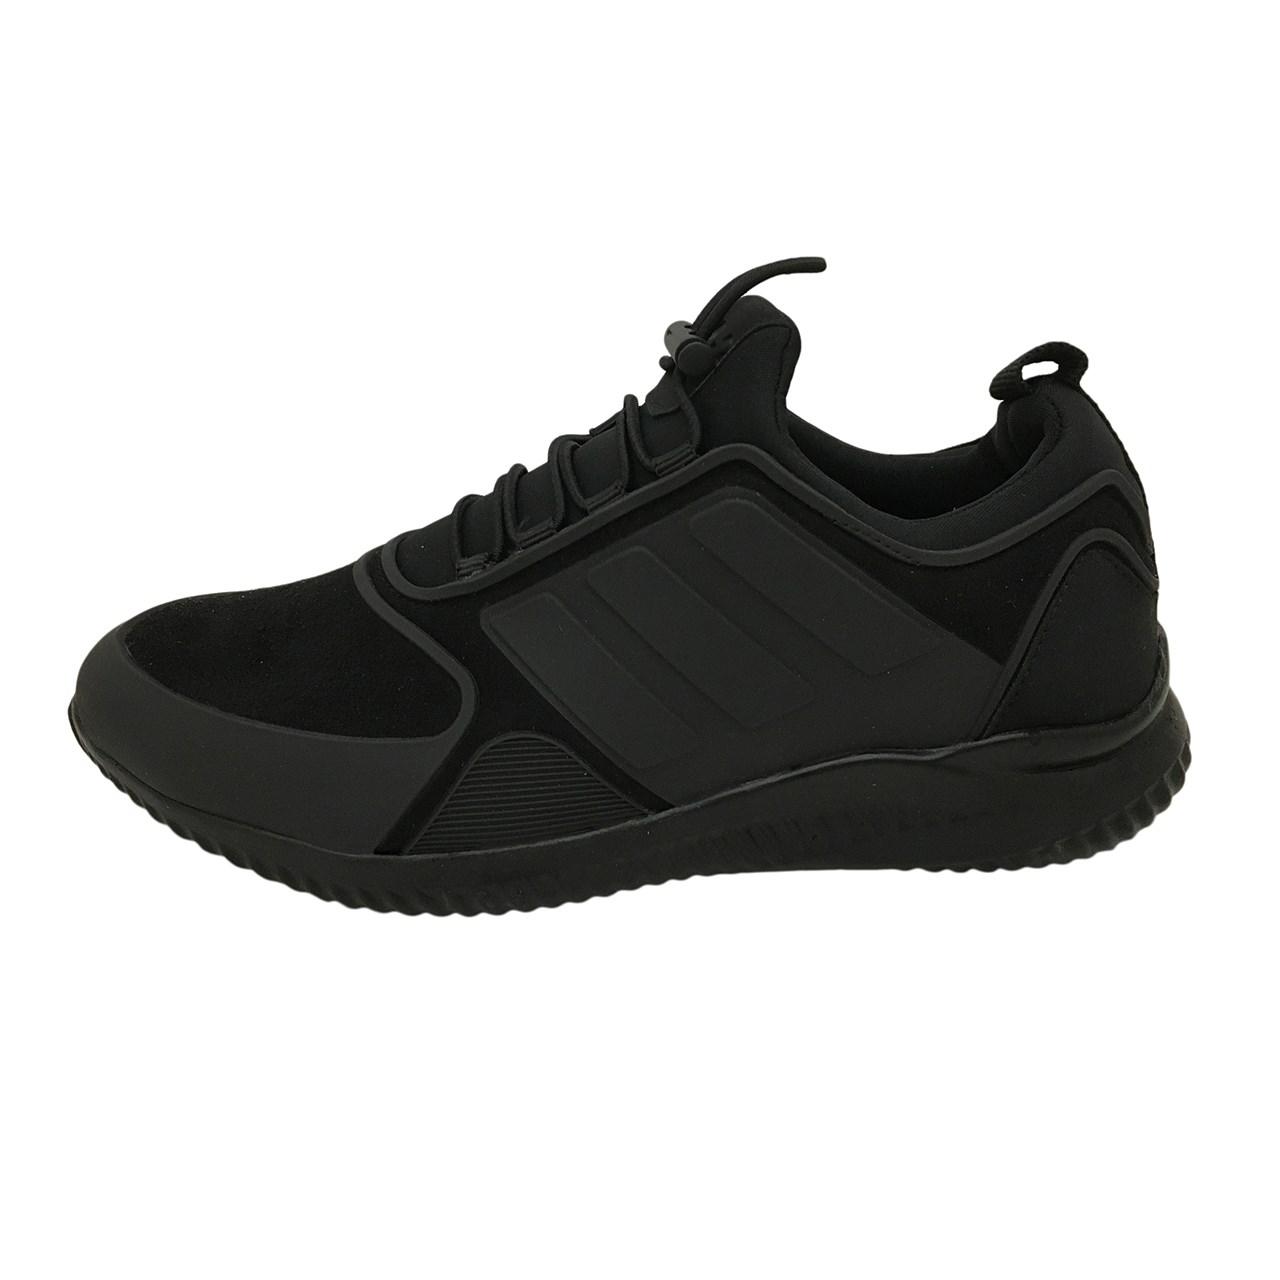 کفش راحتی مردانه لالیگا مدل 1122